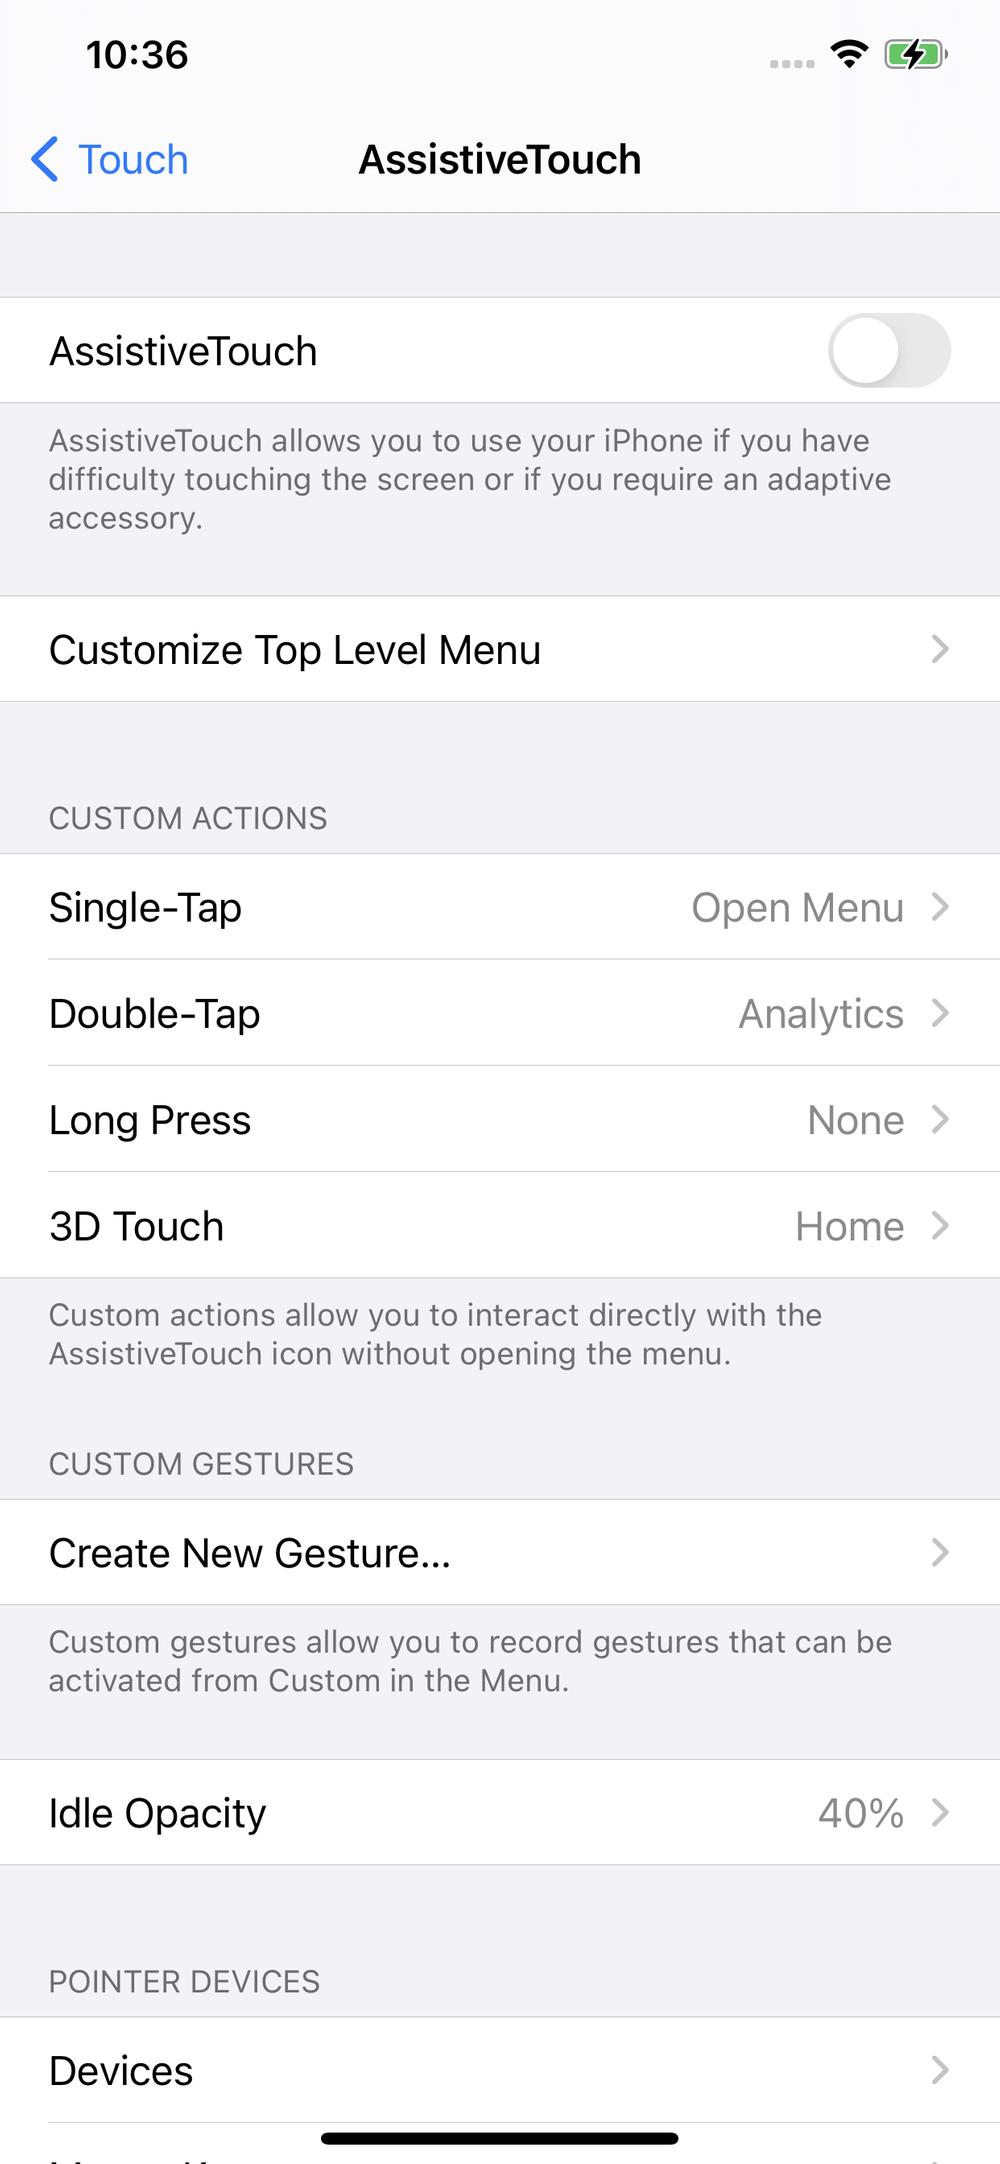 AssistiveTouch settings screen